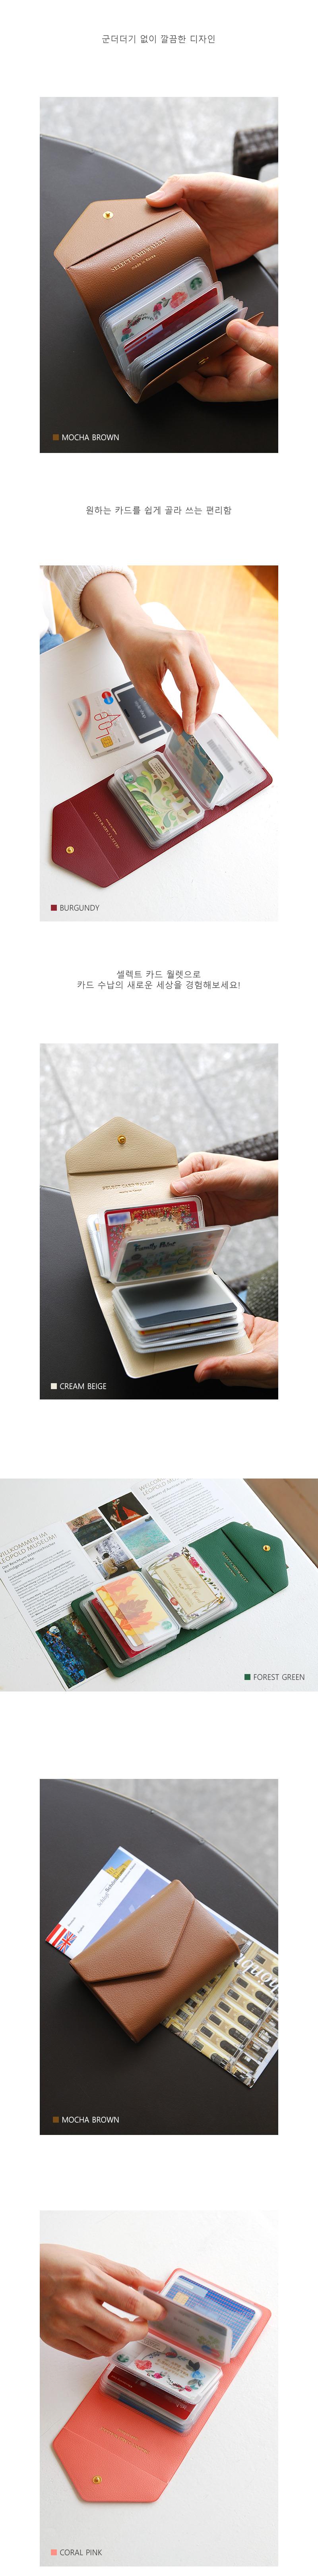 Select Card Wallet - 플레픽, 13,700원, 동전/카드지갑, 카드지갑